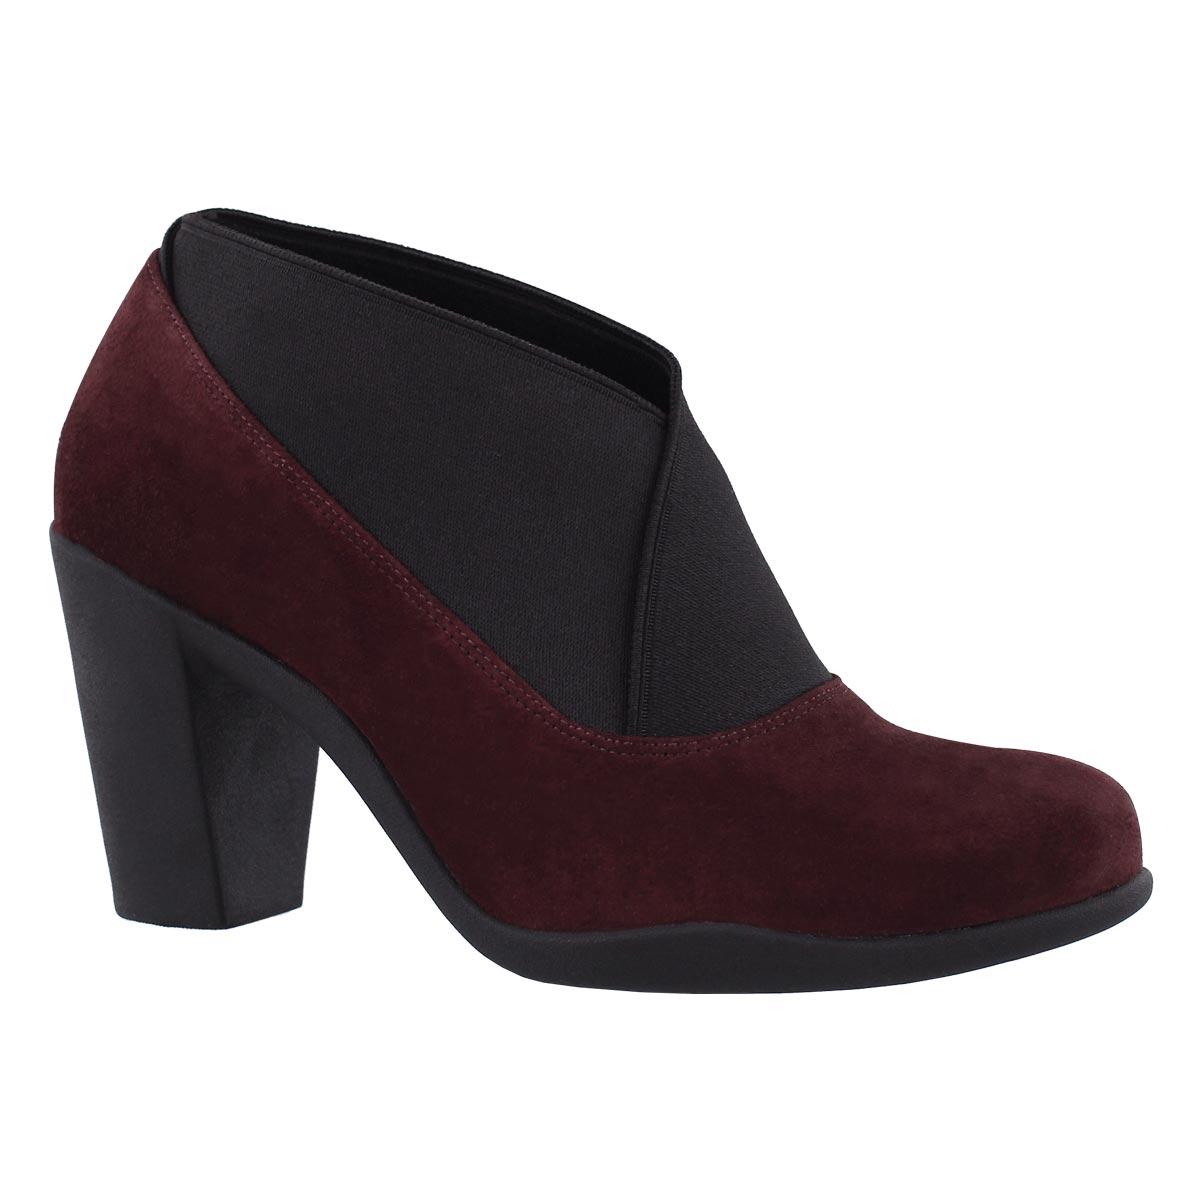 Women's ADYA LUNA burgundy dress heels